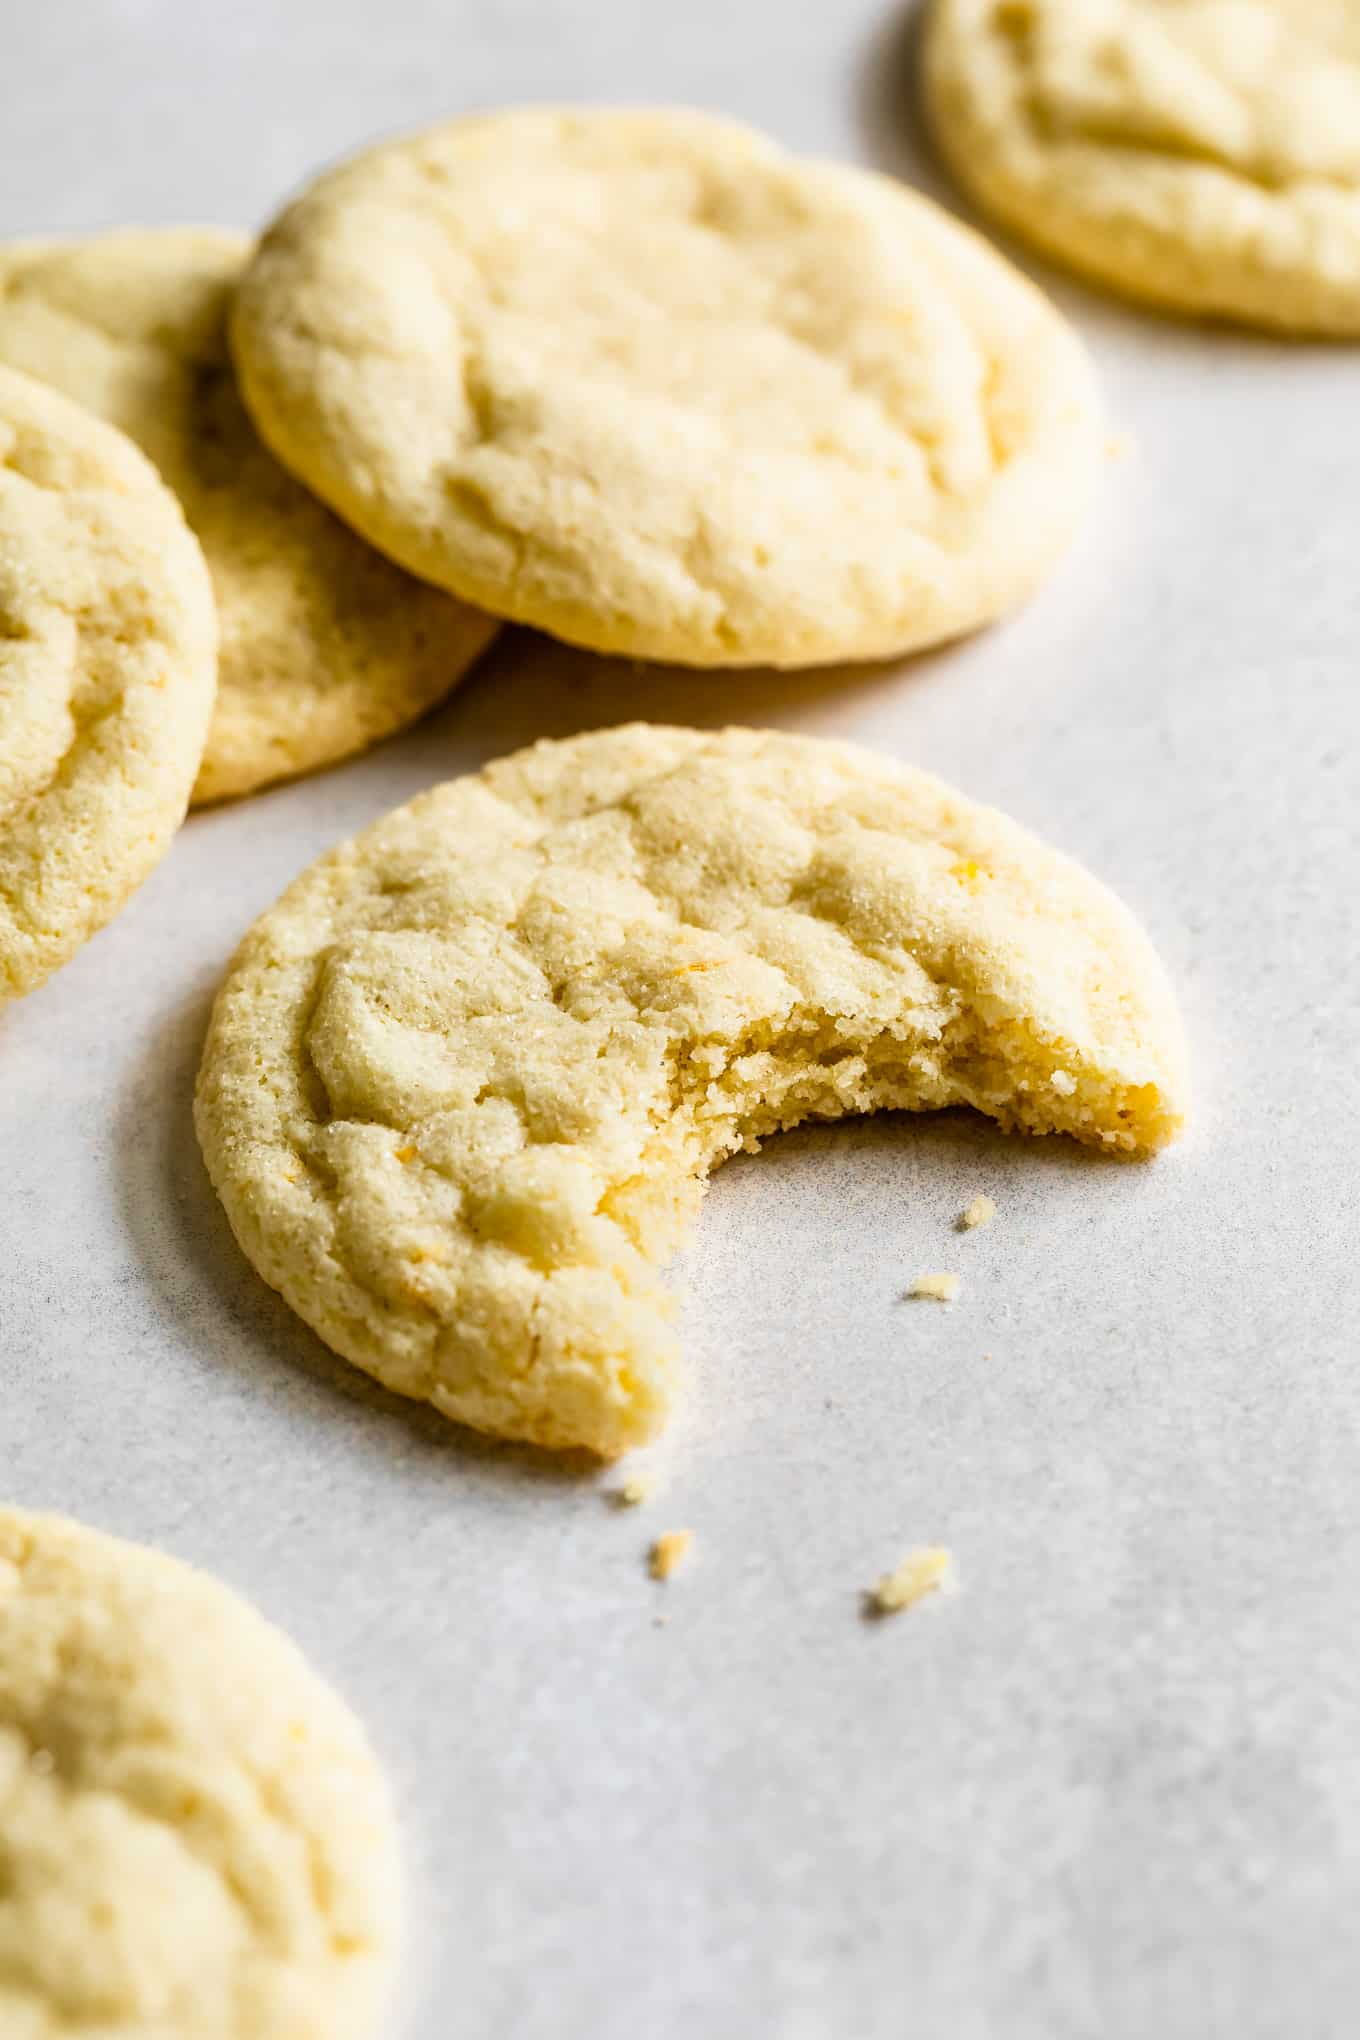 Chewy Gluten-Free Lemon Cookies